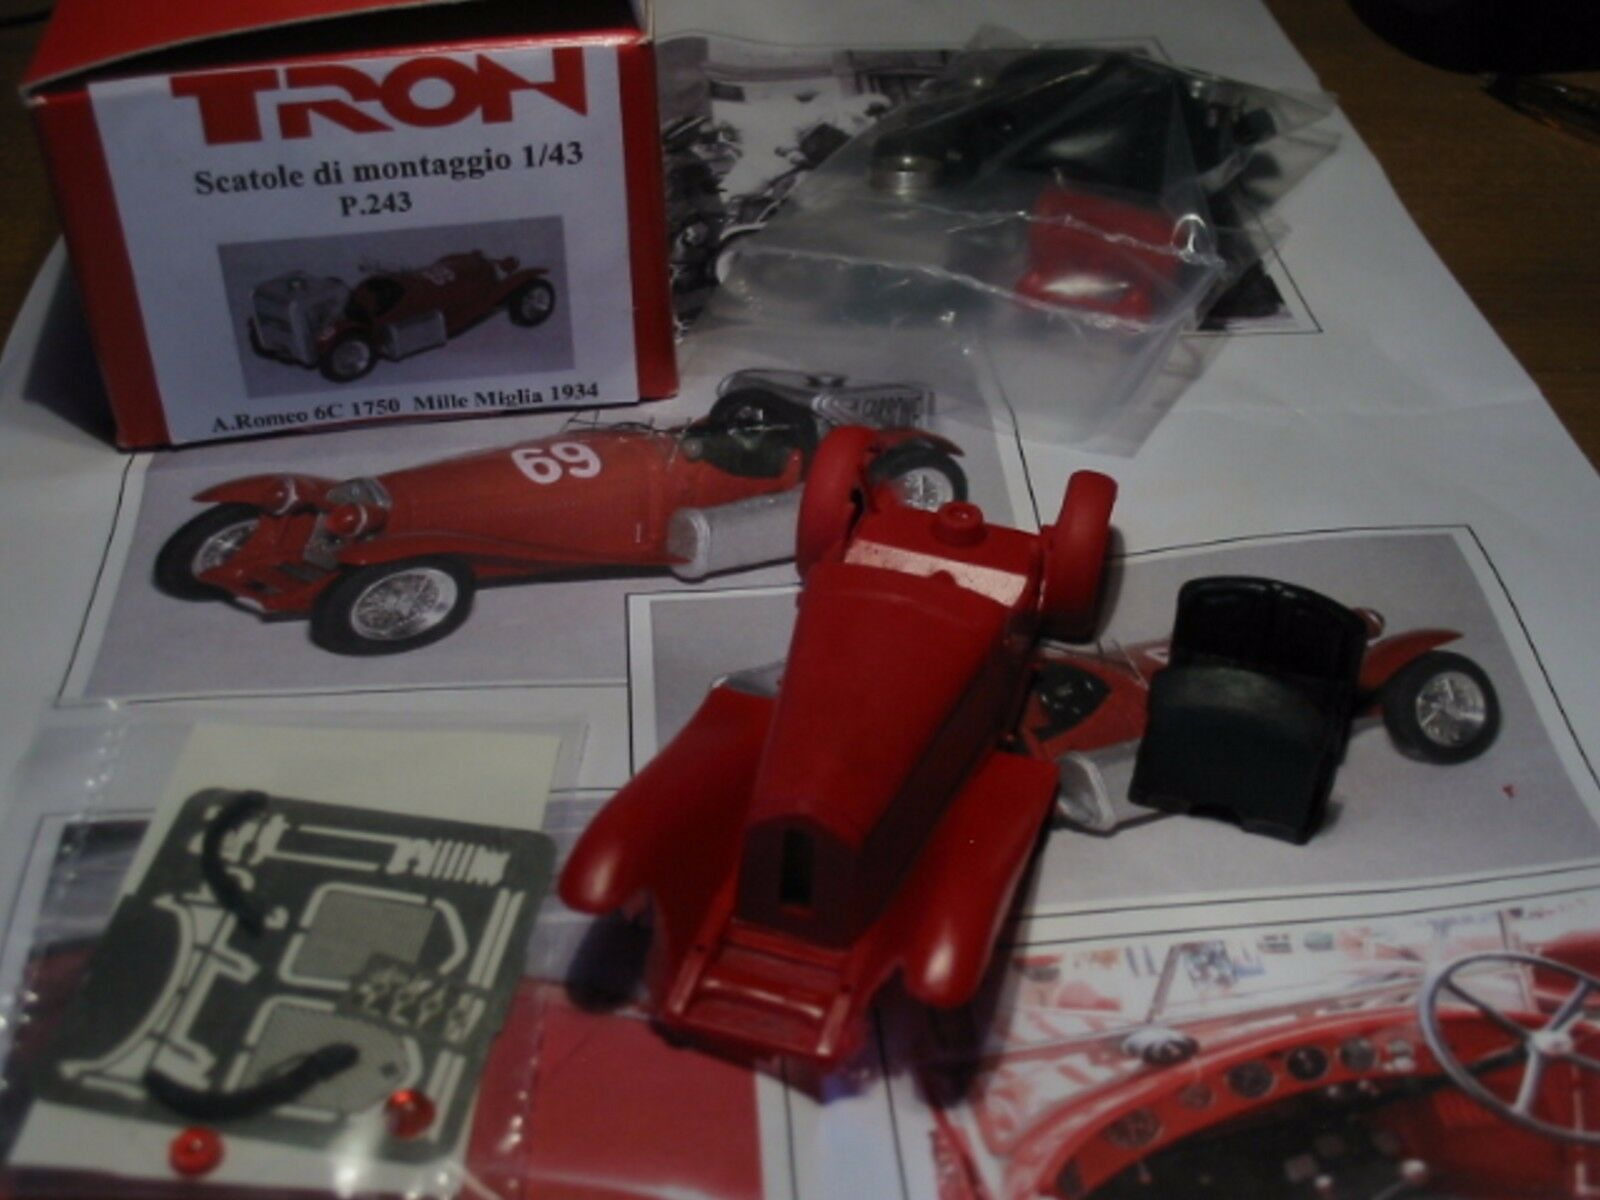 +kit Alfa Romeo 6C 1750 Gasogeno Mille Miglia 1933 - Tron Models kit 1 43